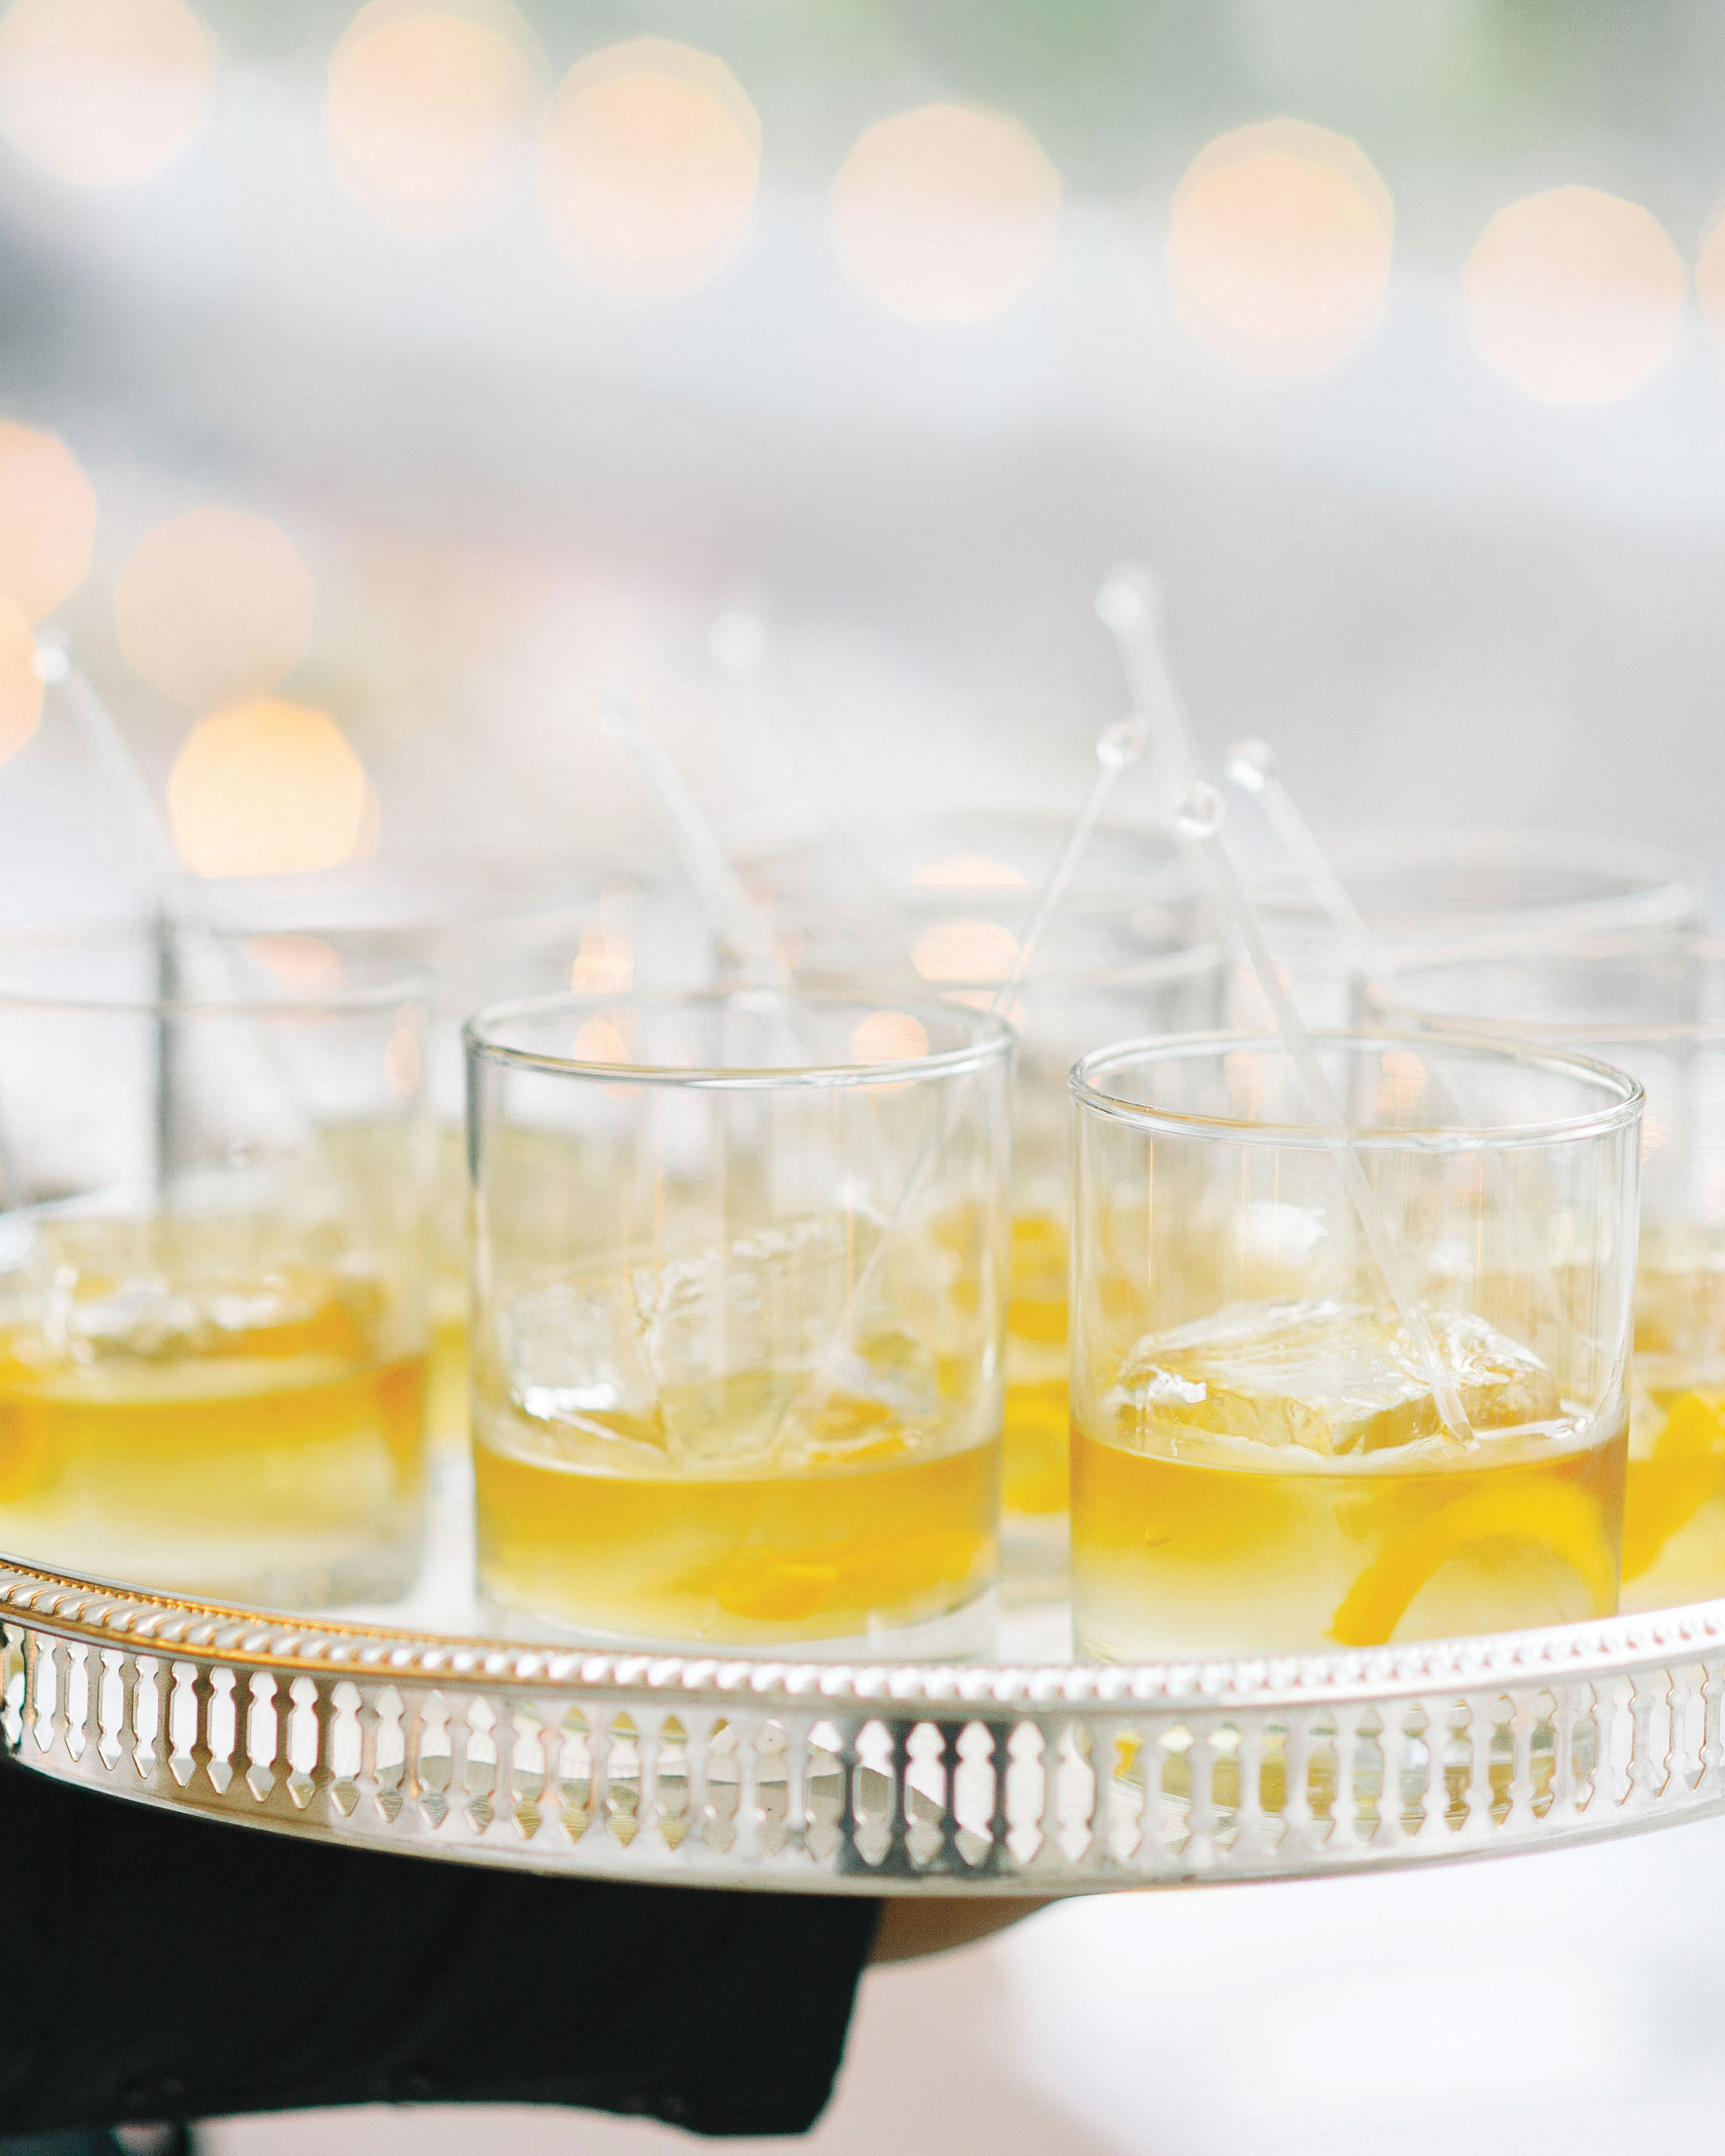 mamy-dan-wedding-canada-details-old-fashioned-cocktails-062-s112629.jpg